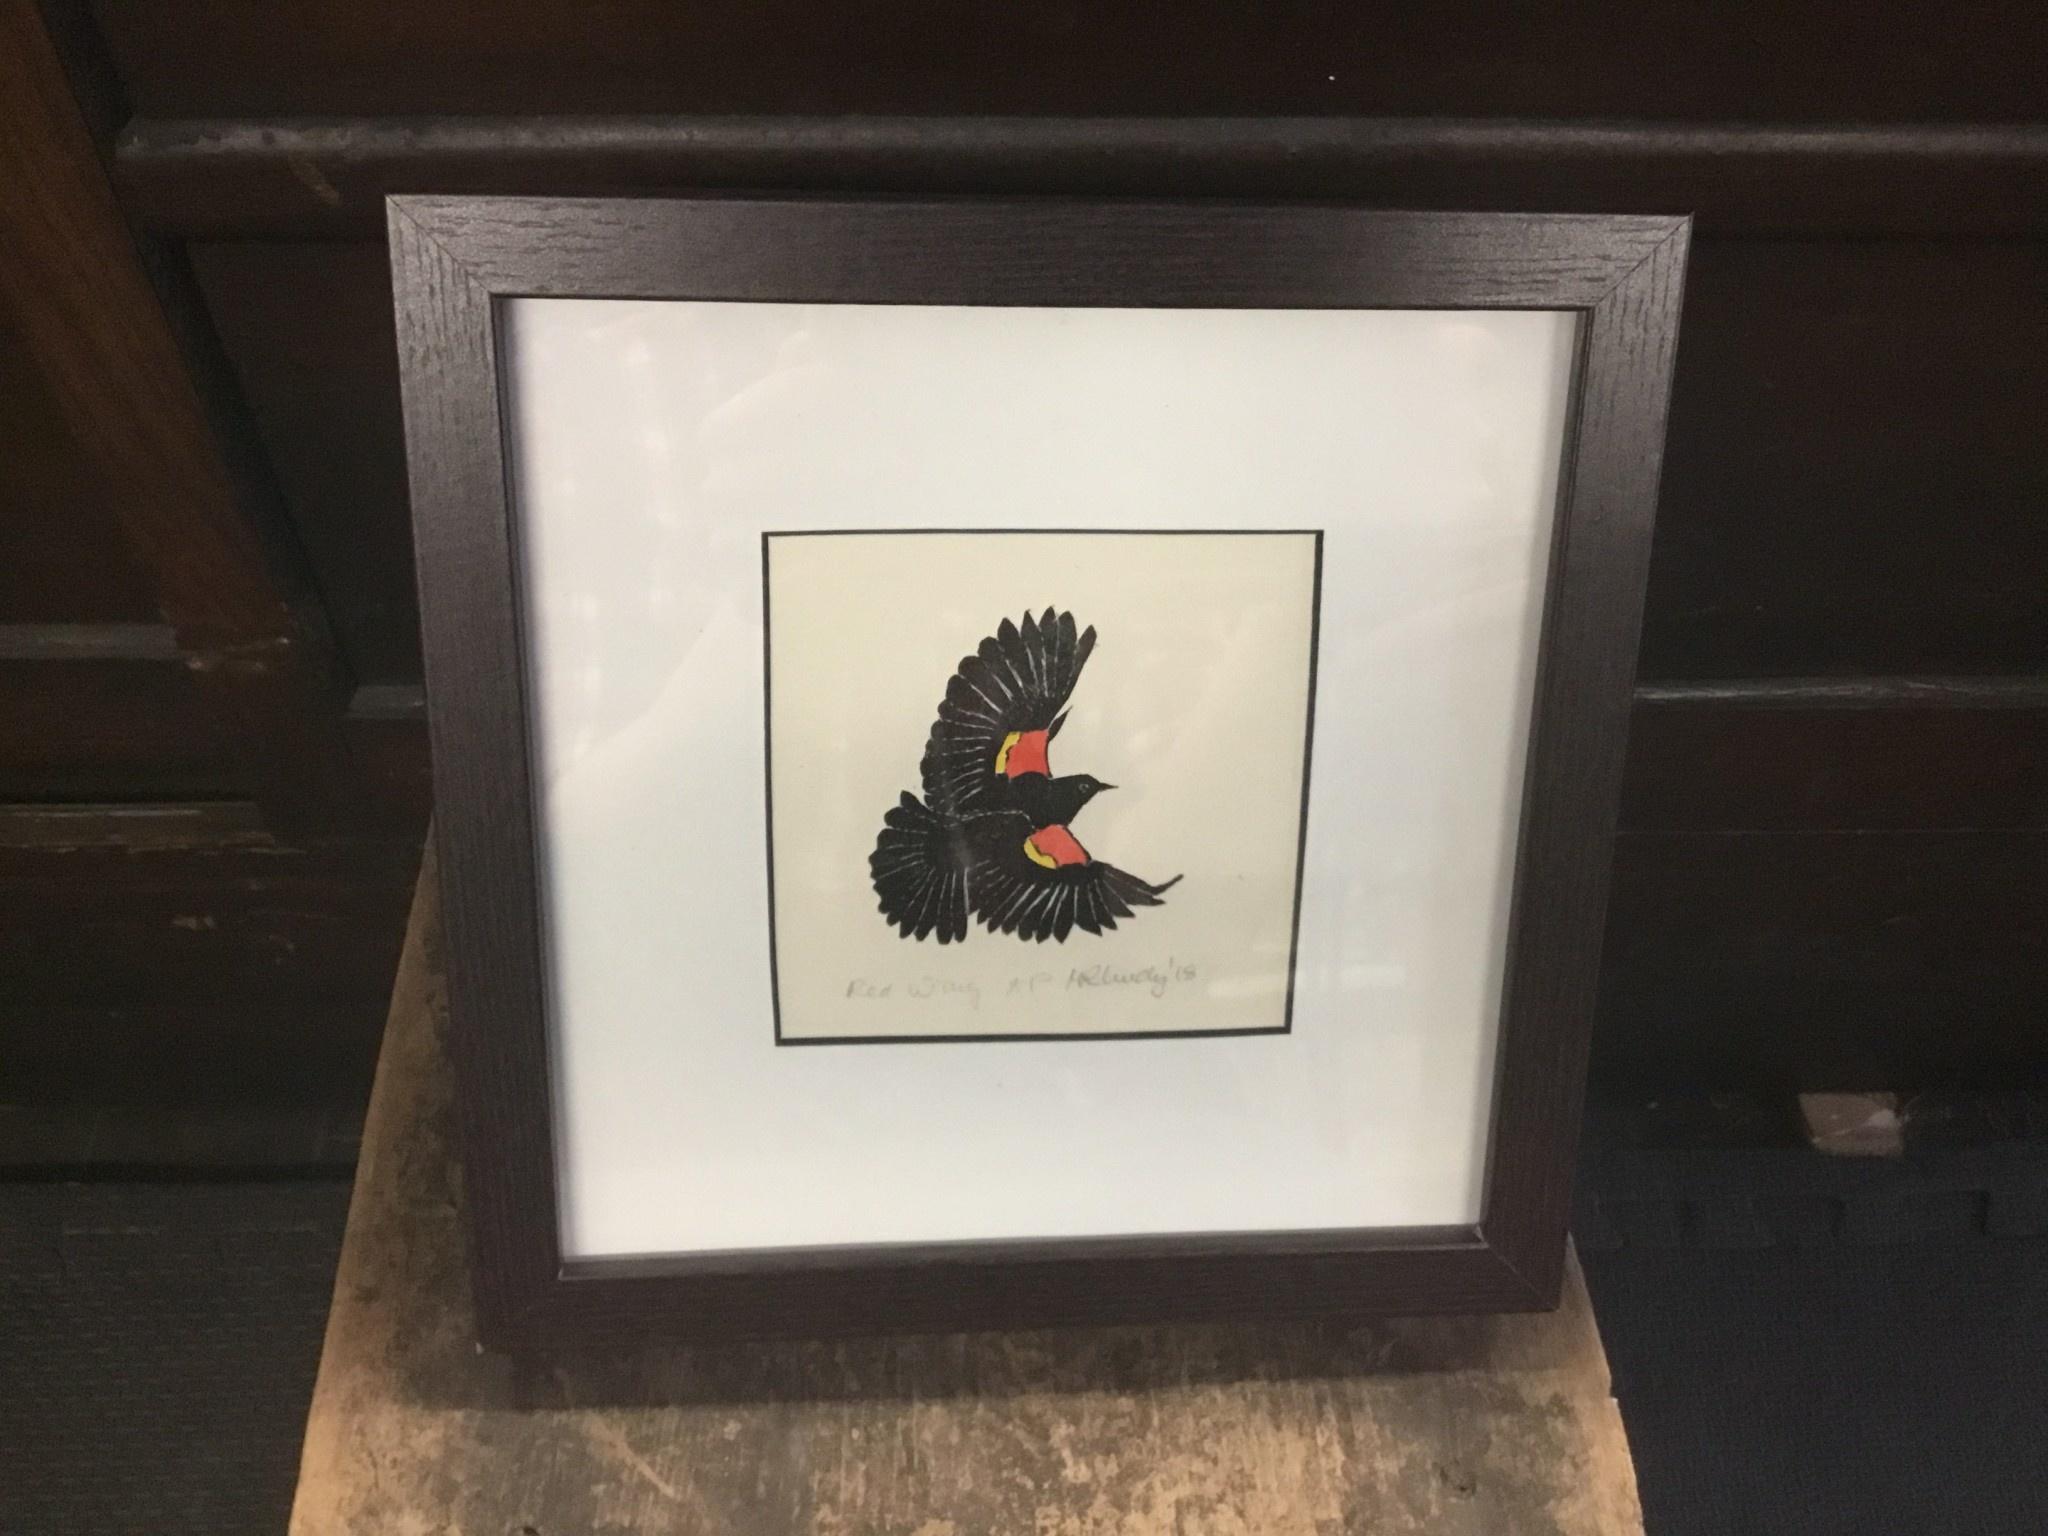 Maggi Rhudy Maggi Prints Red Wing Blackbird 8x8